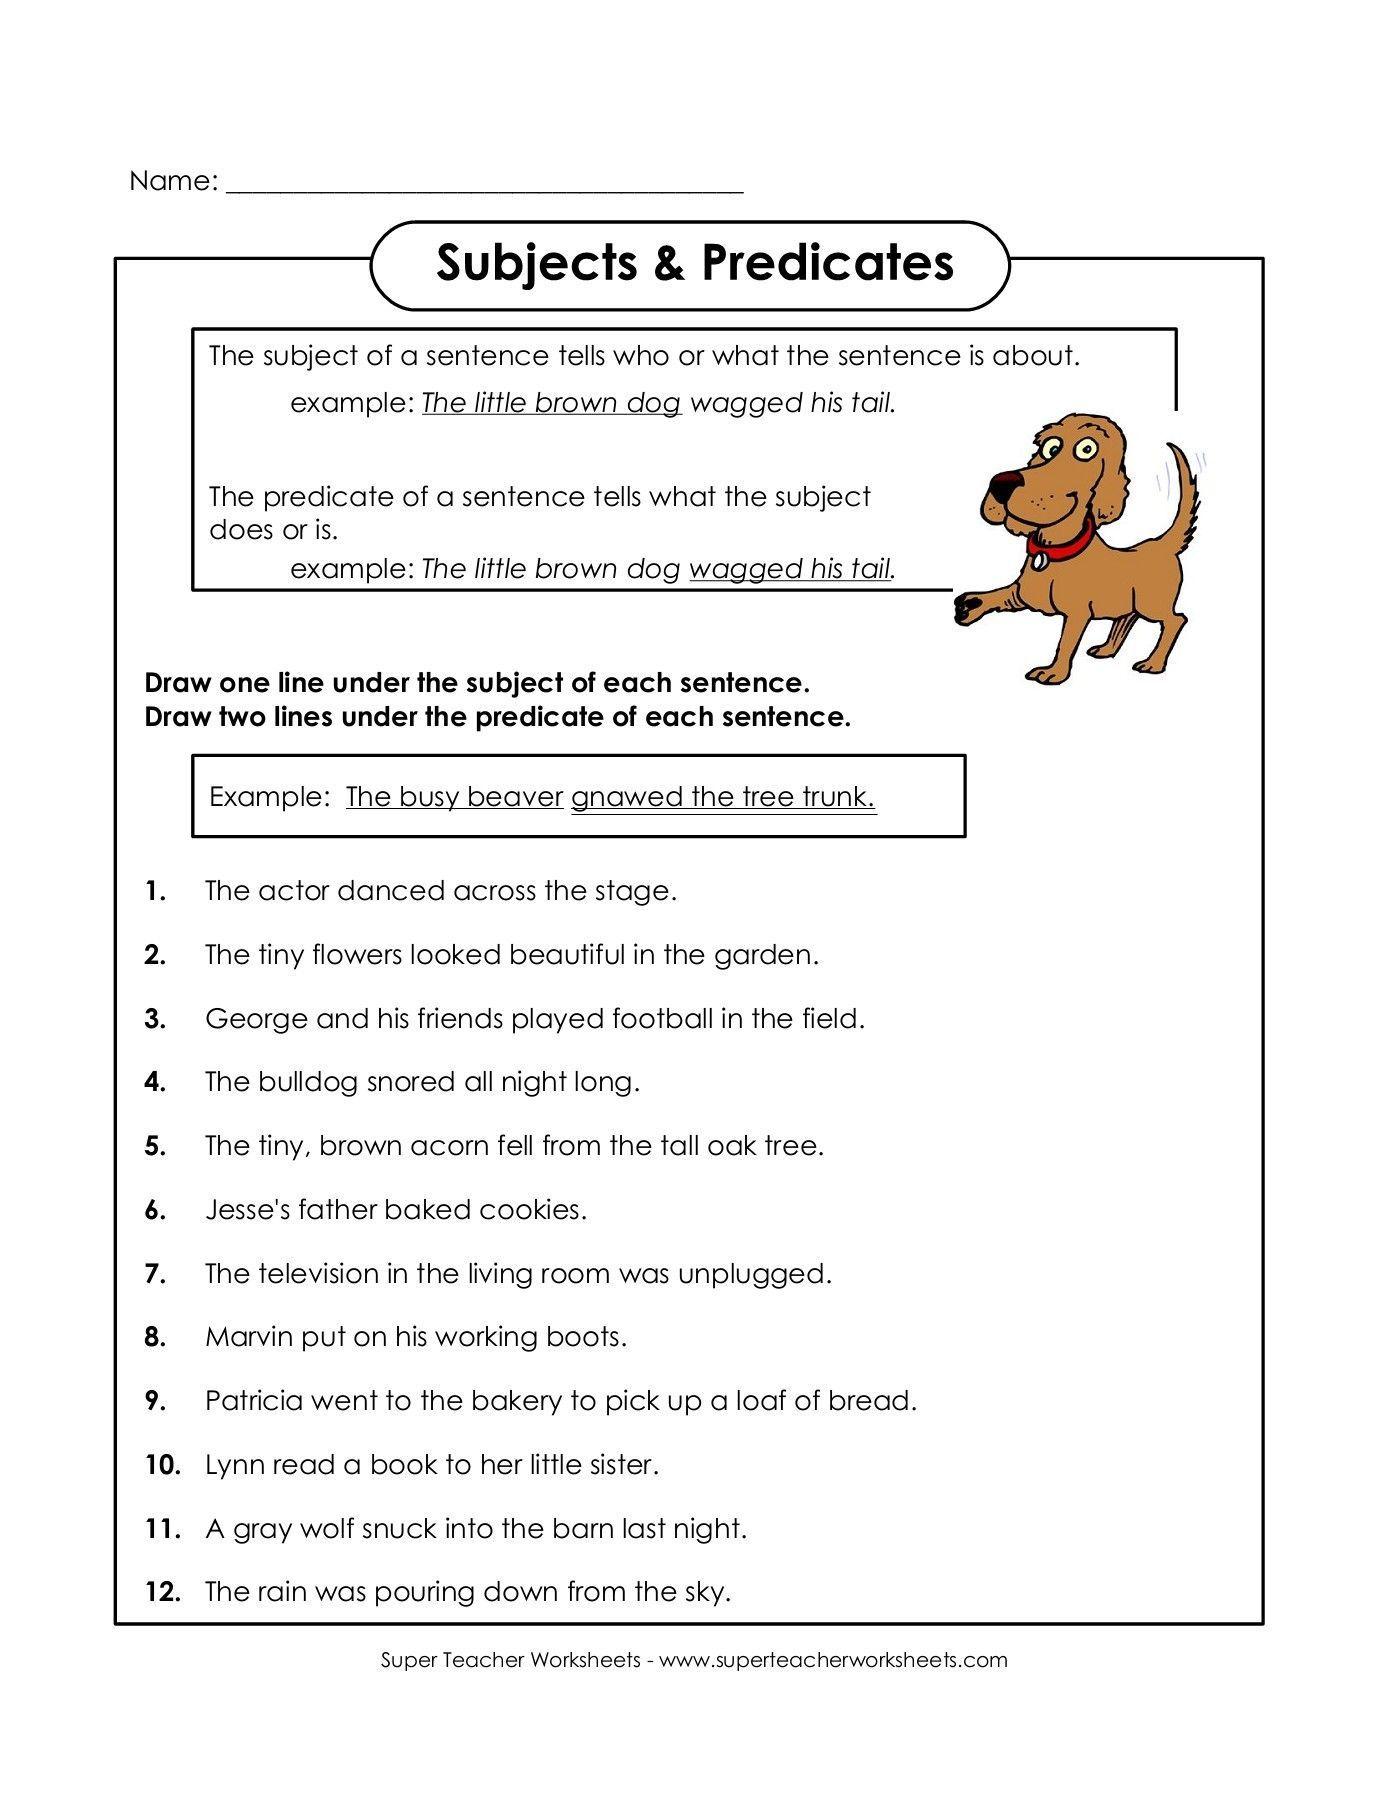 Subjects Predicates Super Teacher Worksheets 770748923711030764 Super Teacher Worksheets Subject And Predicate Subject And Predicate Worksheets [ 1800 x 1391 Pixel ]